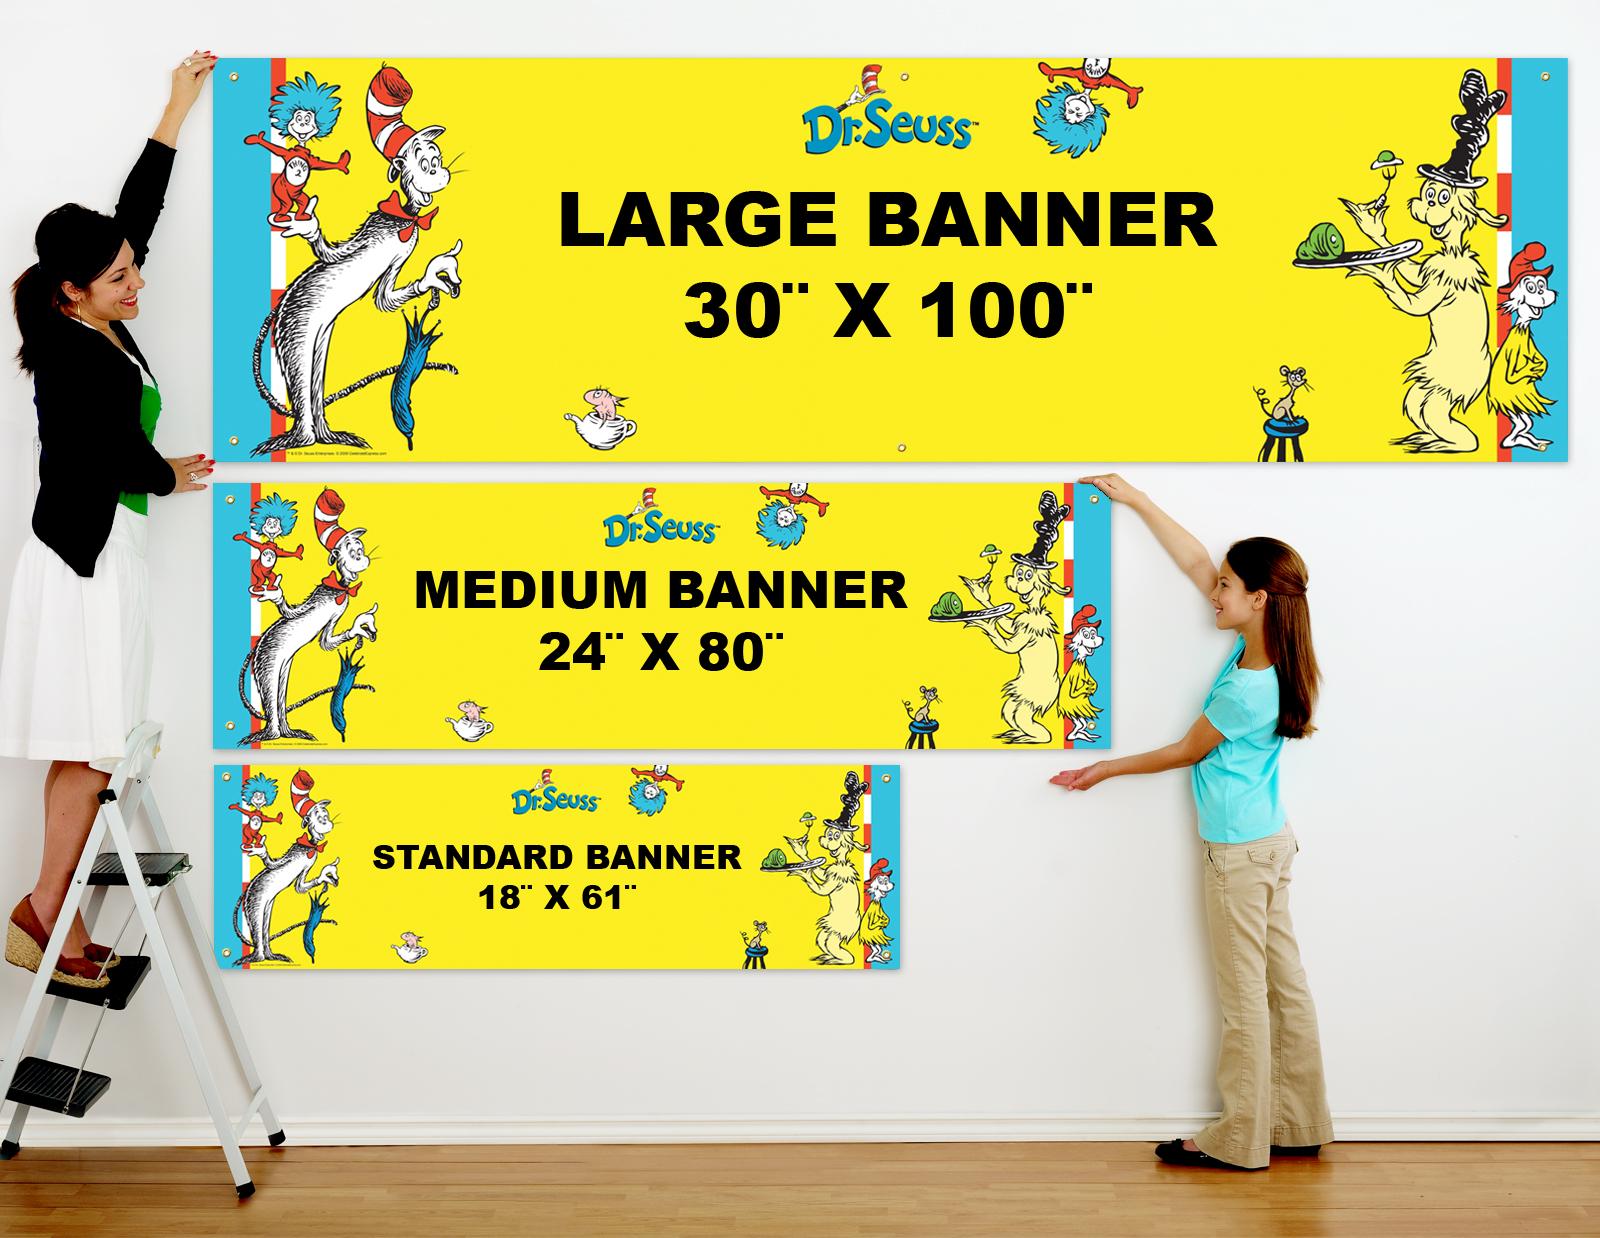 Dr. Seuss Personalized Vinyl Banner | BirthdayExpress.com